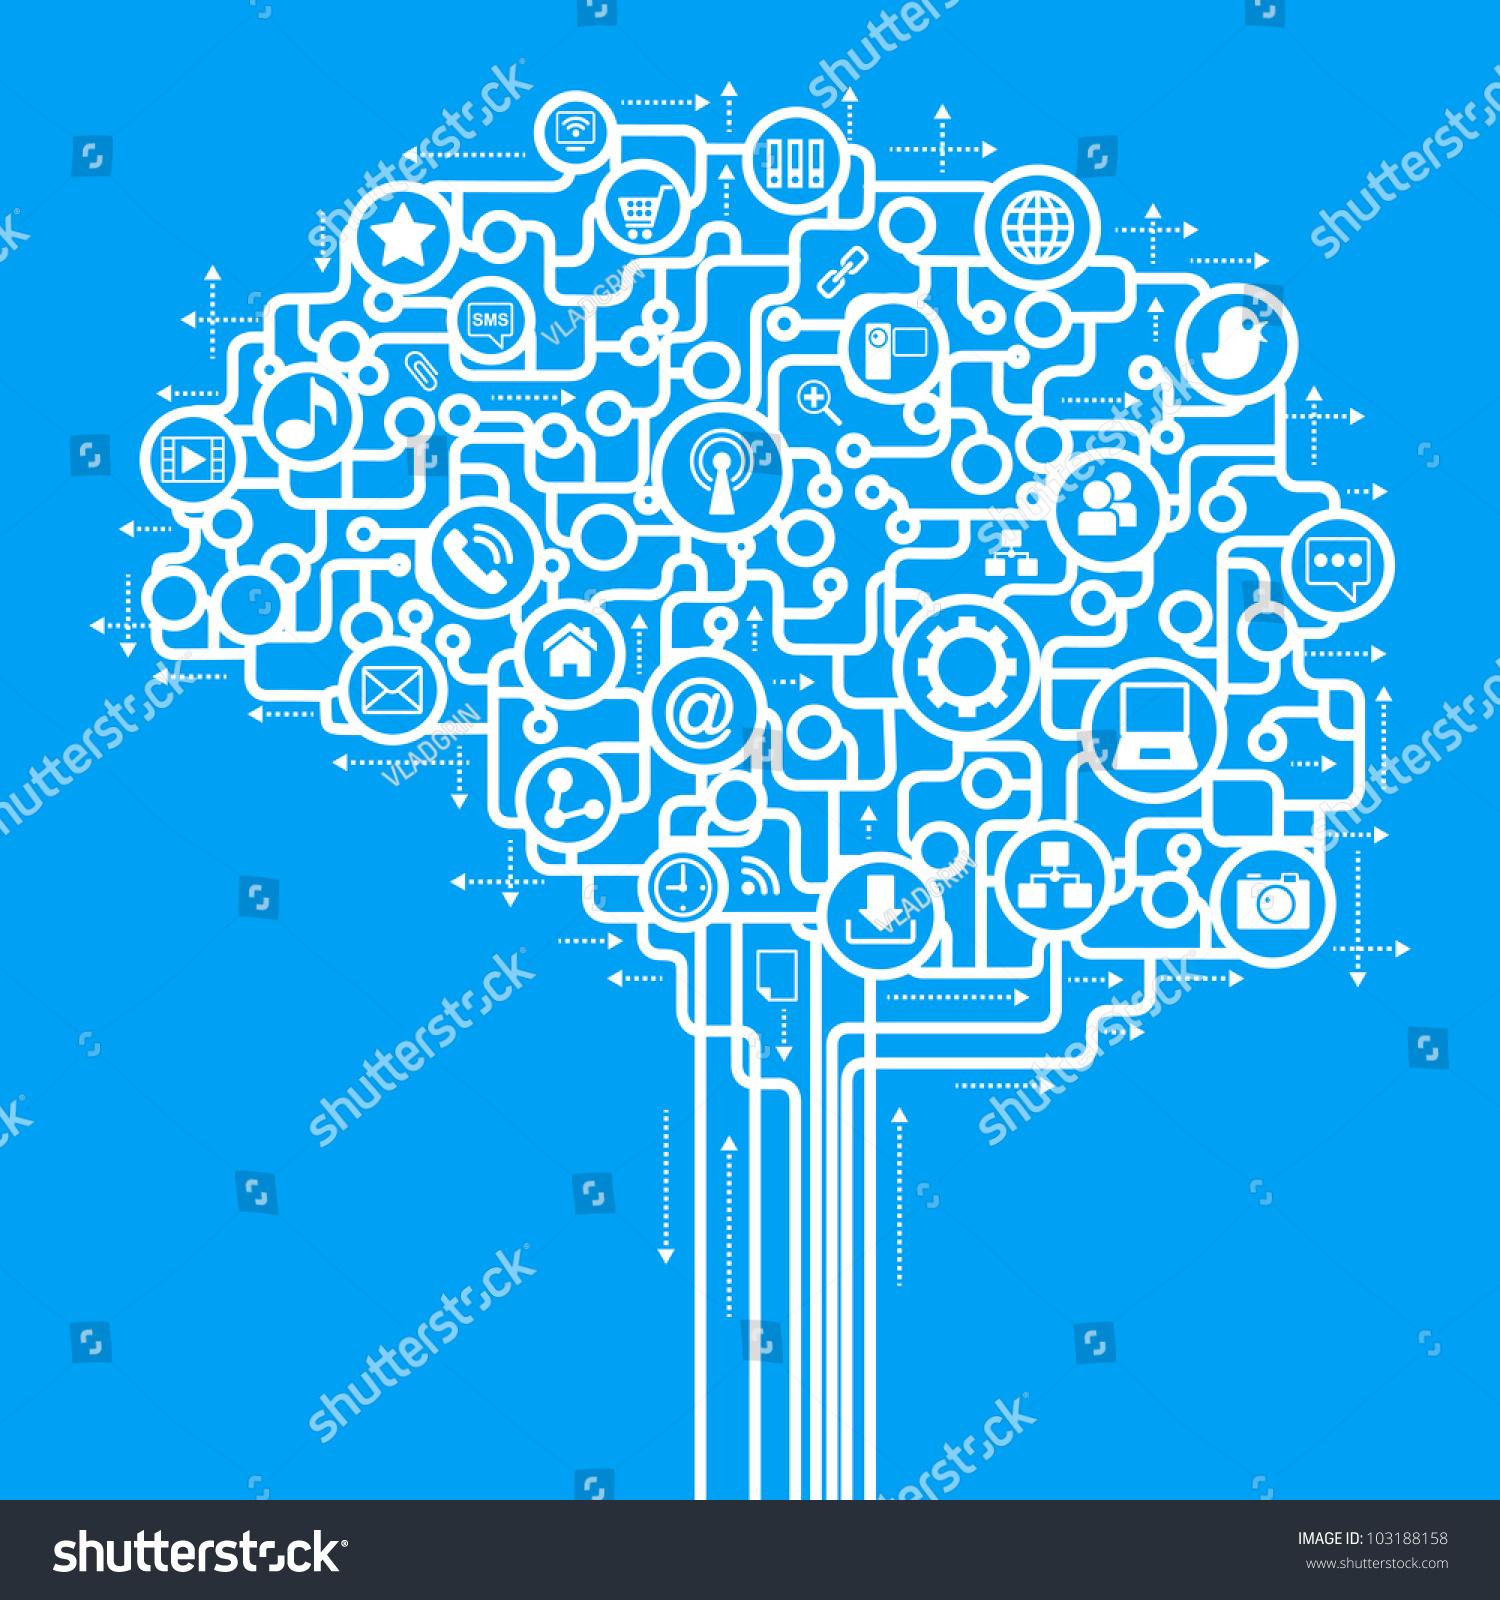 abstract human brain computer network social stock vector